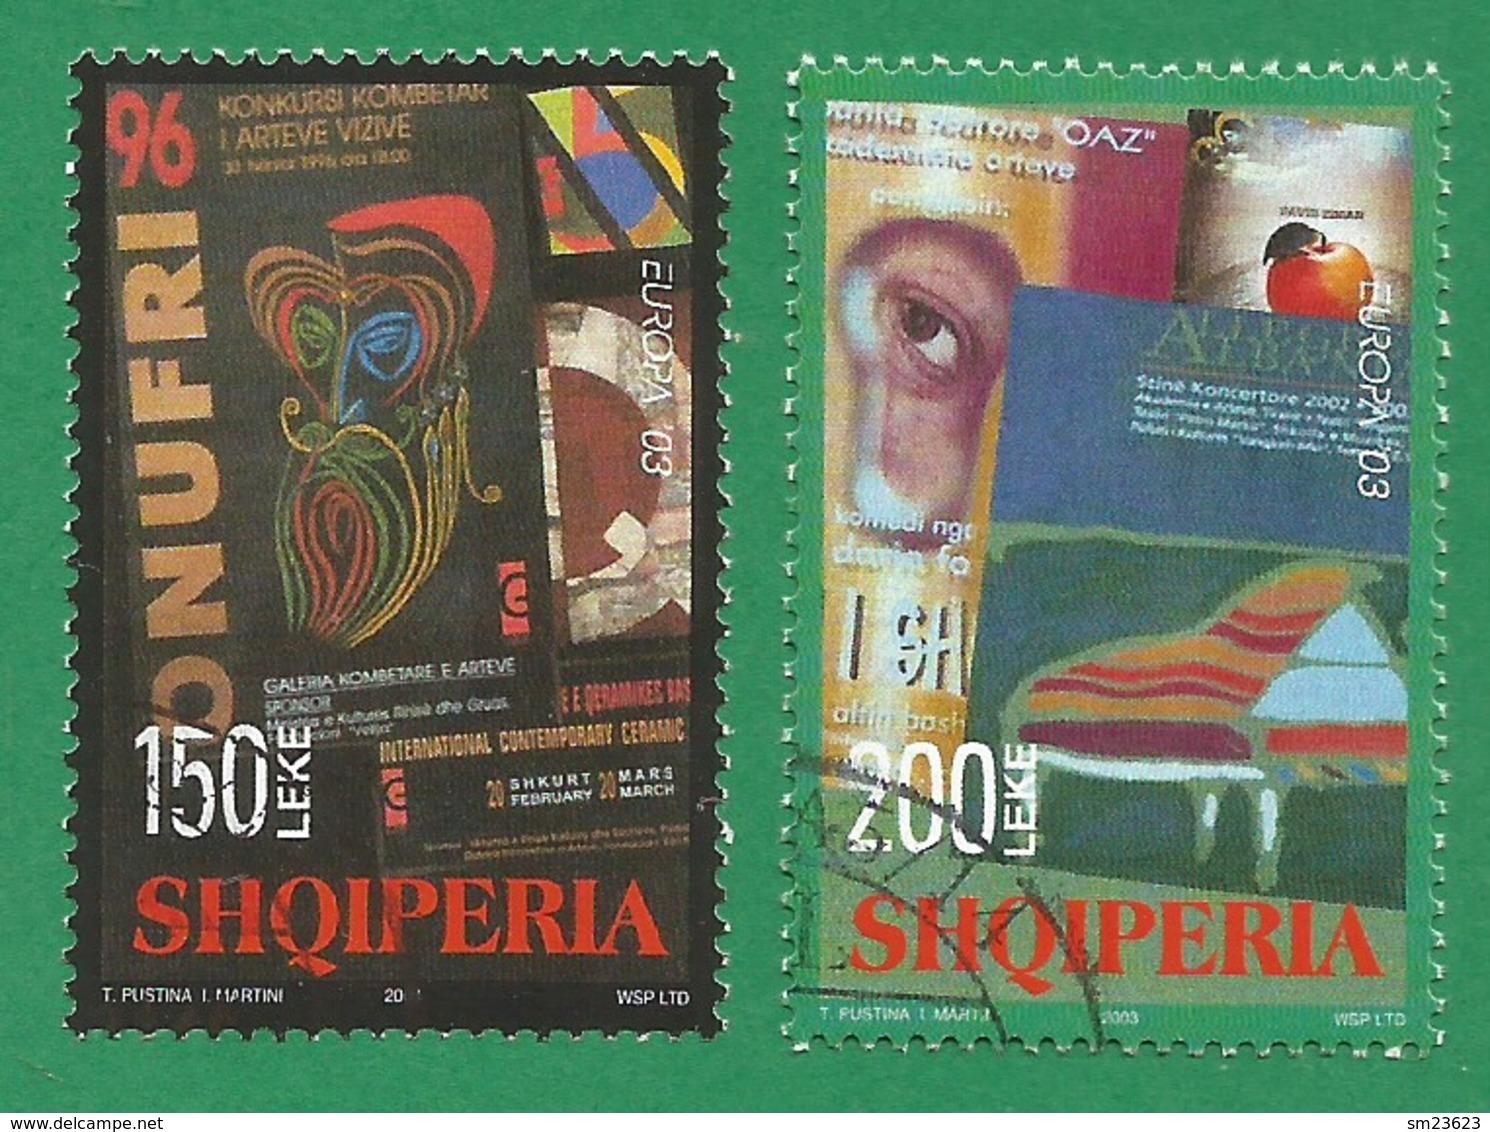 Albanien  2003   Mi.Nr. 2928 / 2929 , EUROPA CEPT  Plakatkunst - Gestempelt / Fine Used / (o) - Europa-CEPT